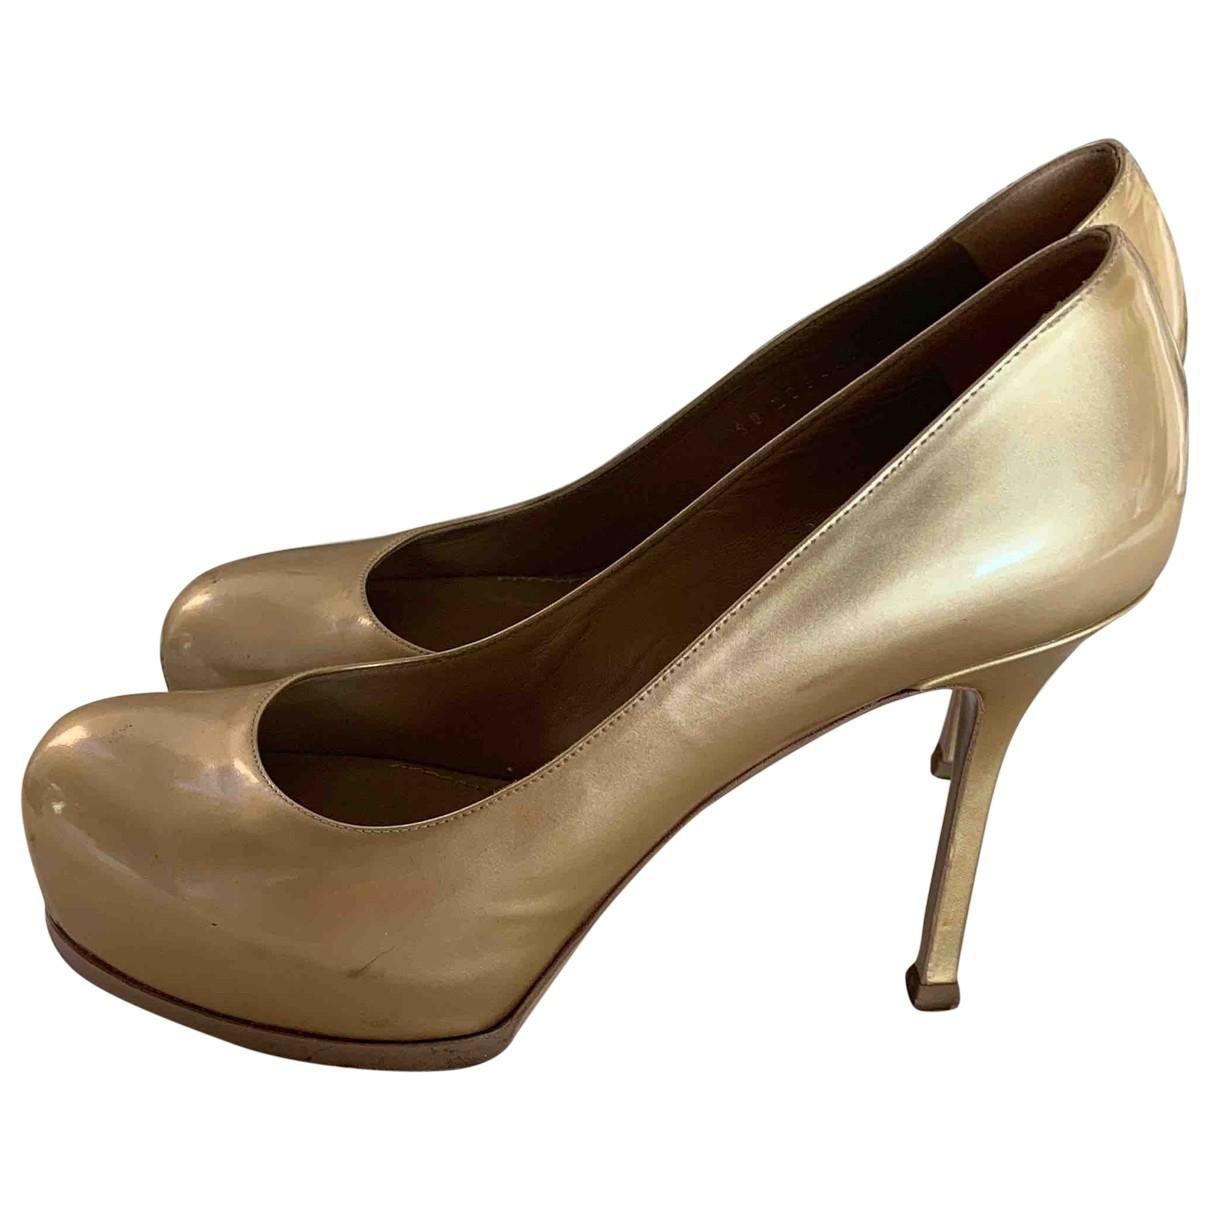 Yves Saint Laurent Trib Too Pumps in  Gold Leder